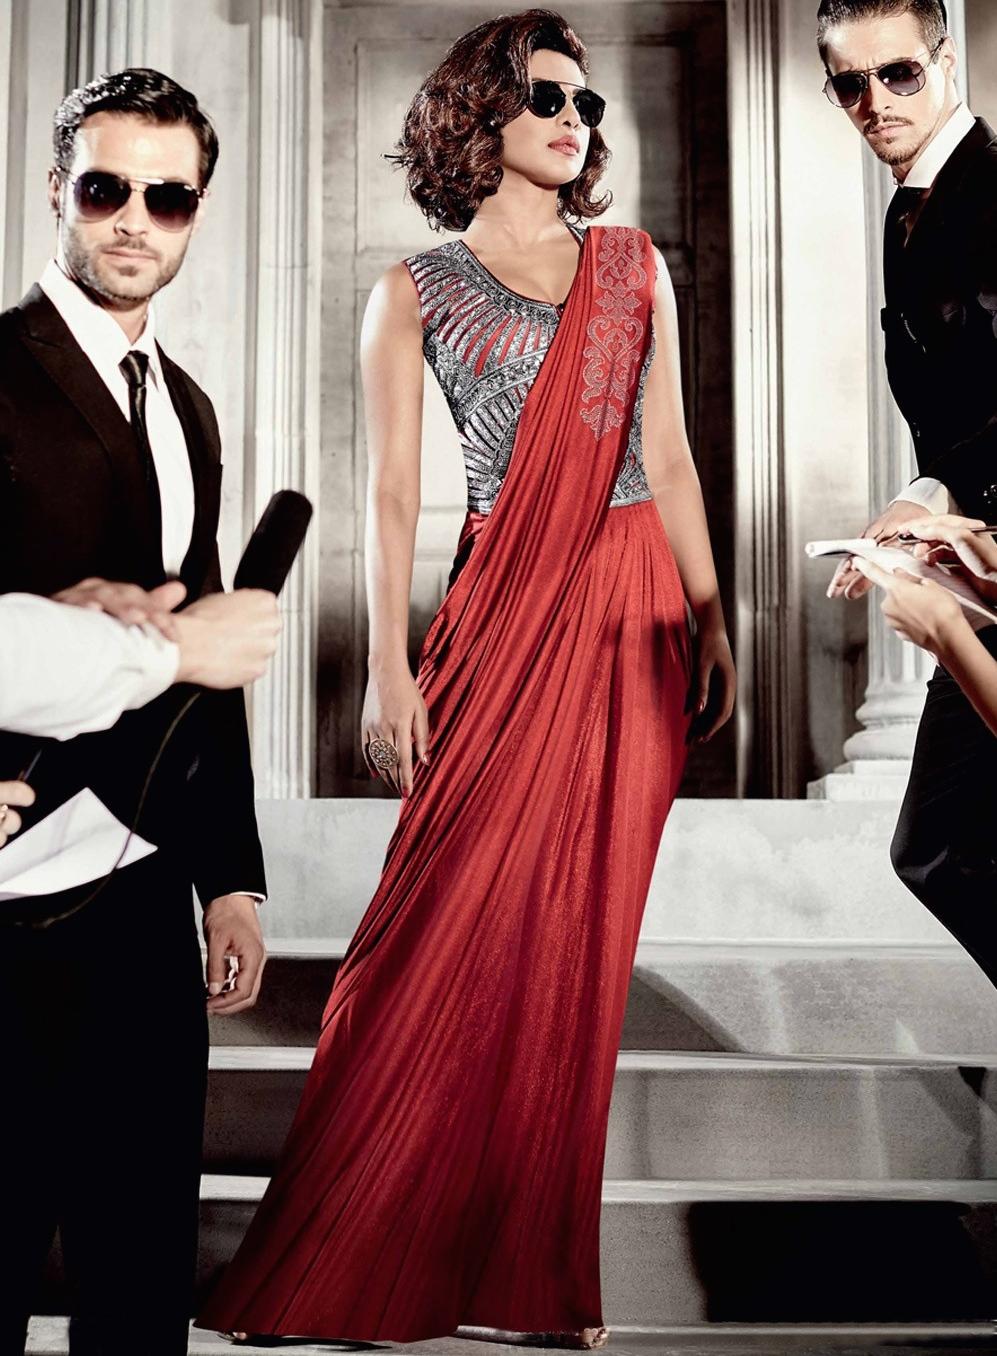 1e586f1d0fcc Priyanka chopra red saree type wedding gown